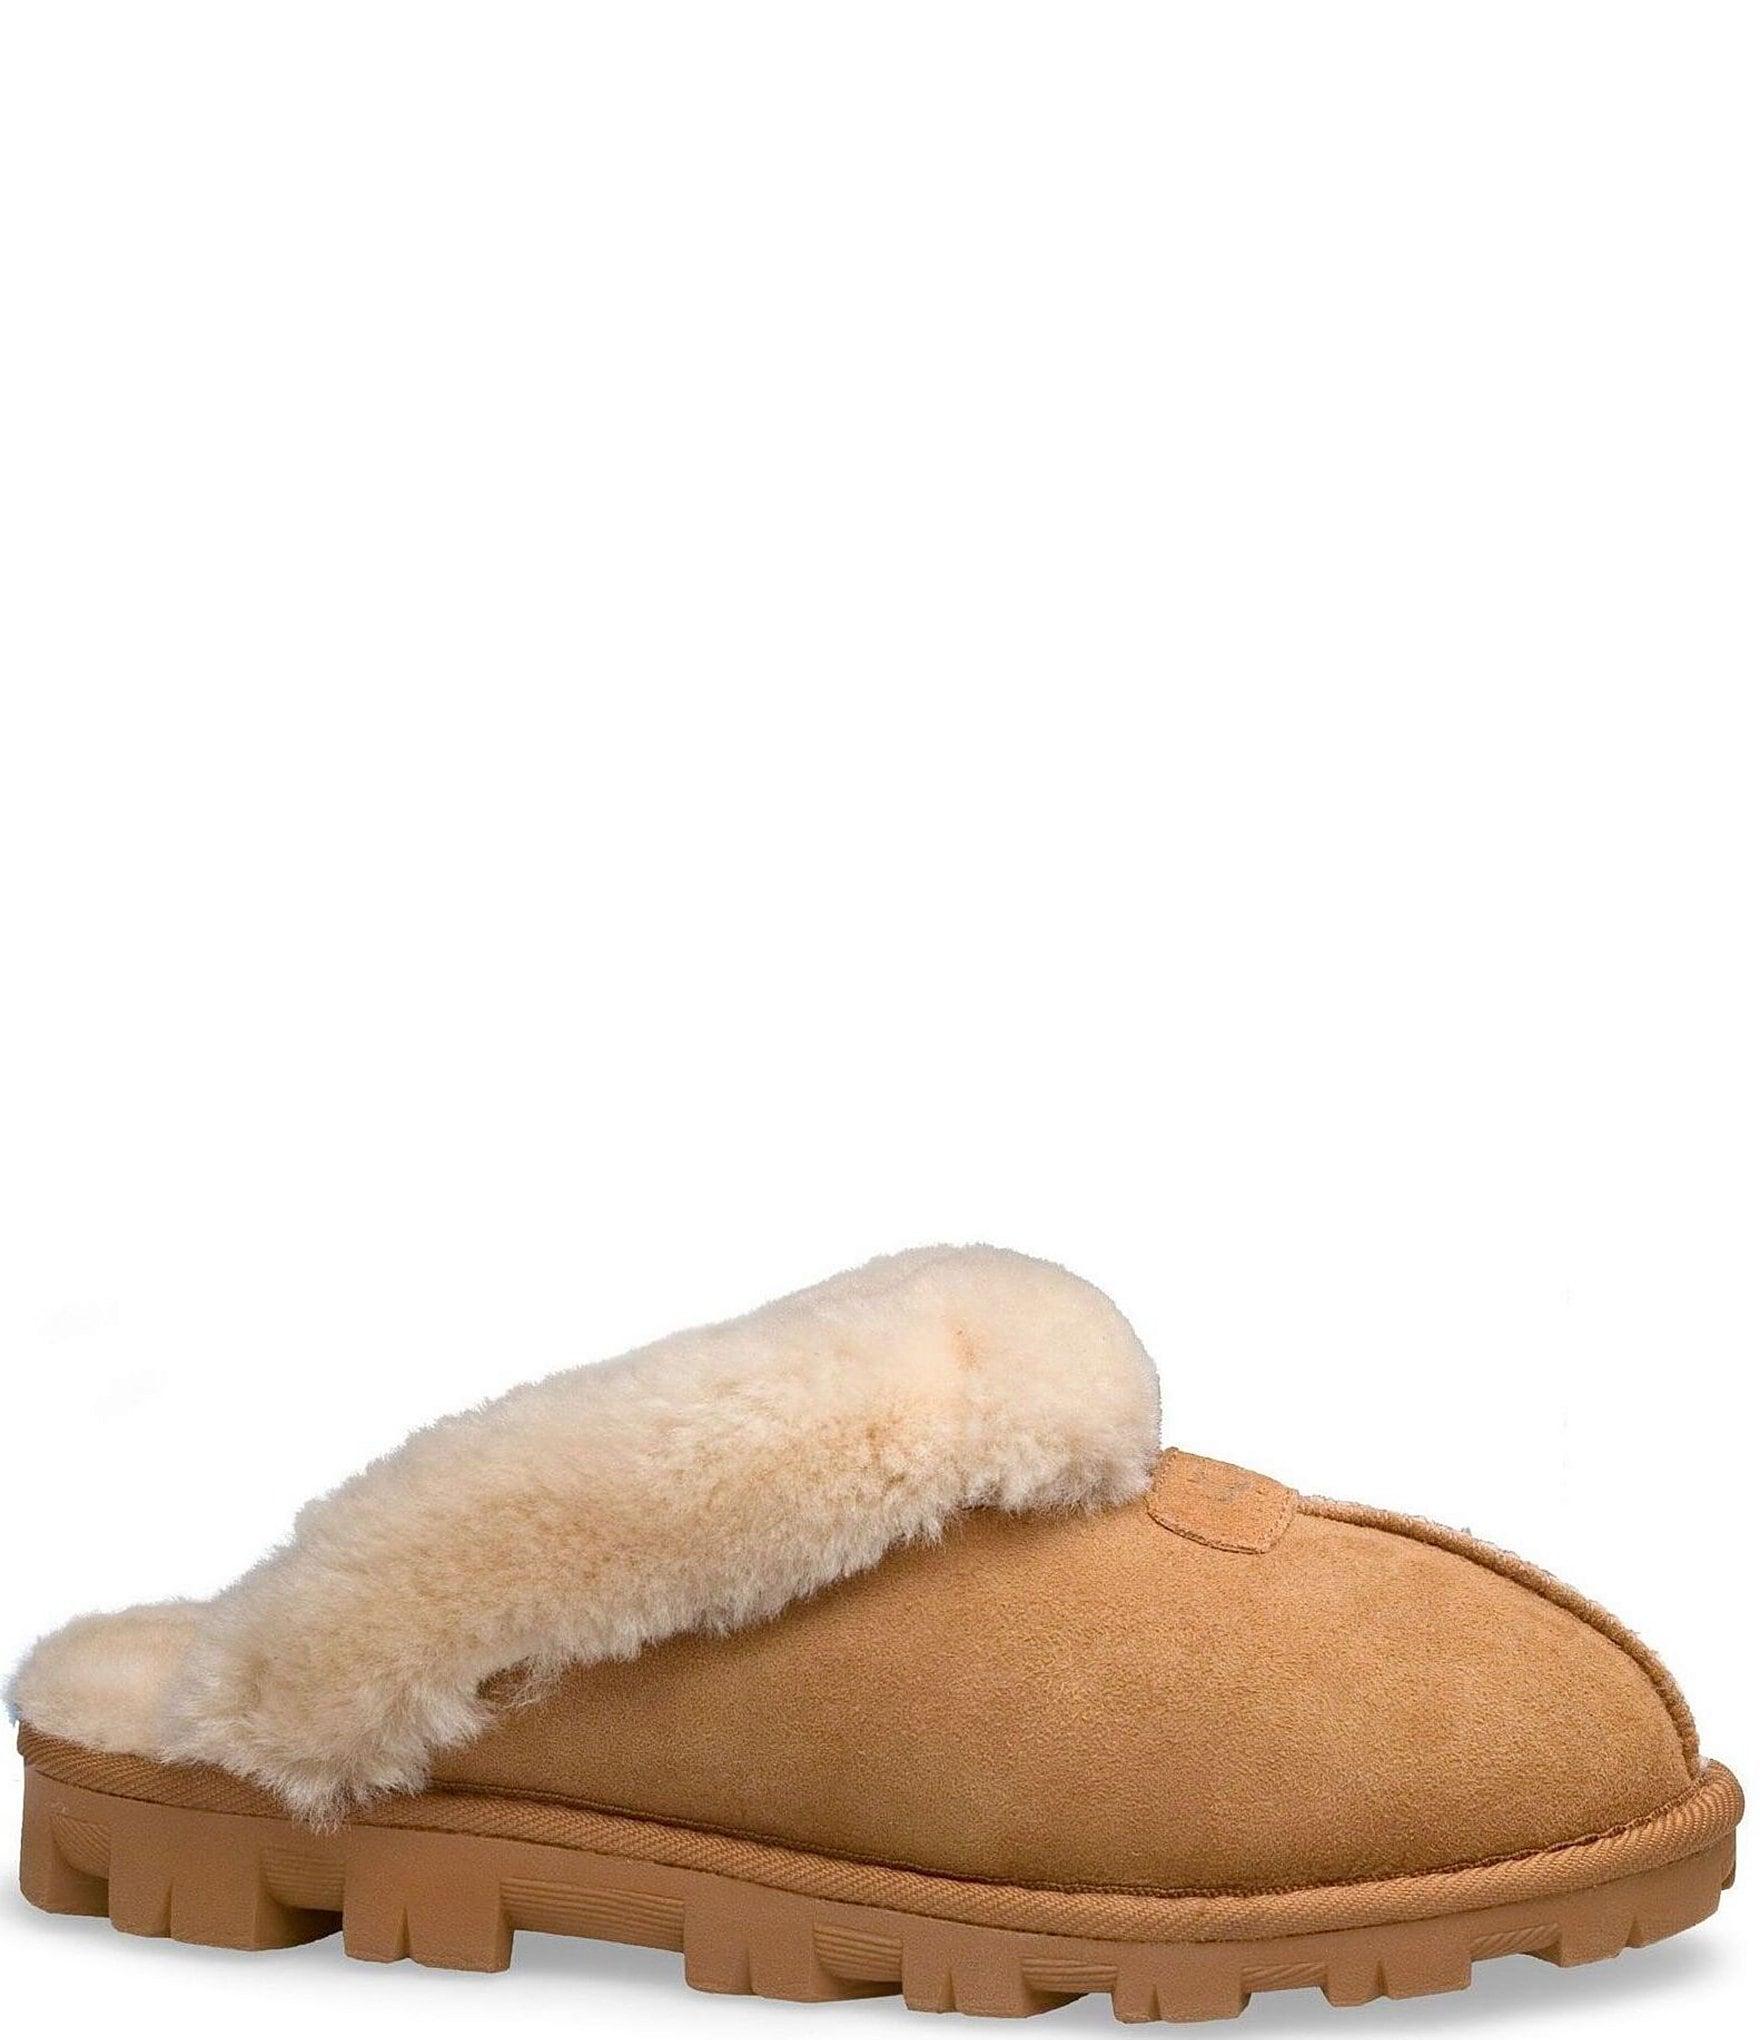 Ugg Brown Women S Slippers Dillard